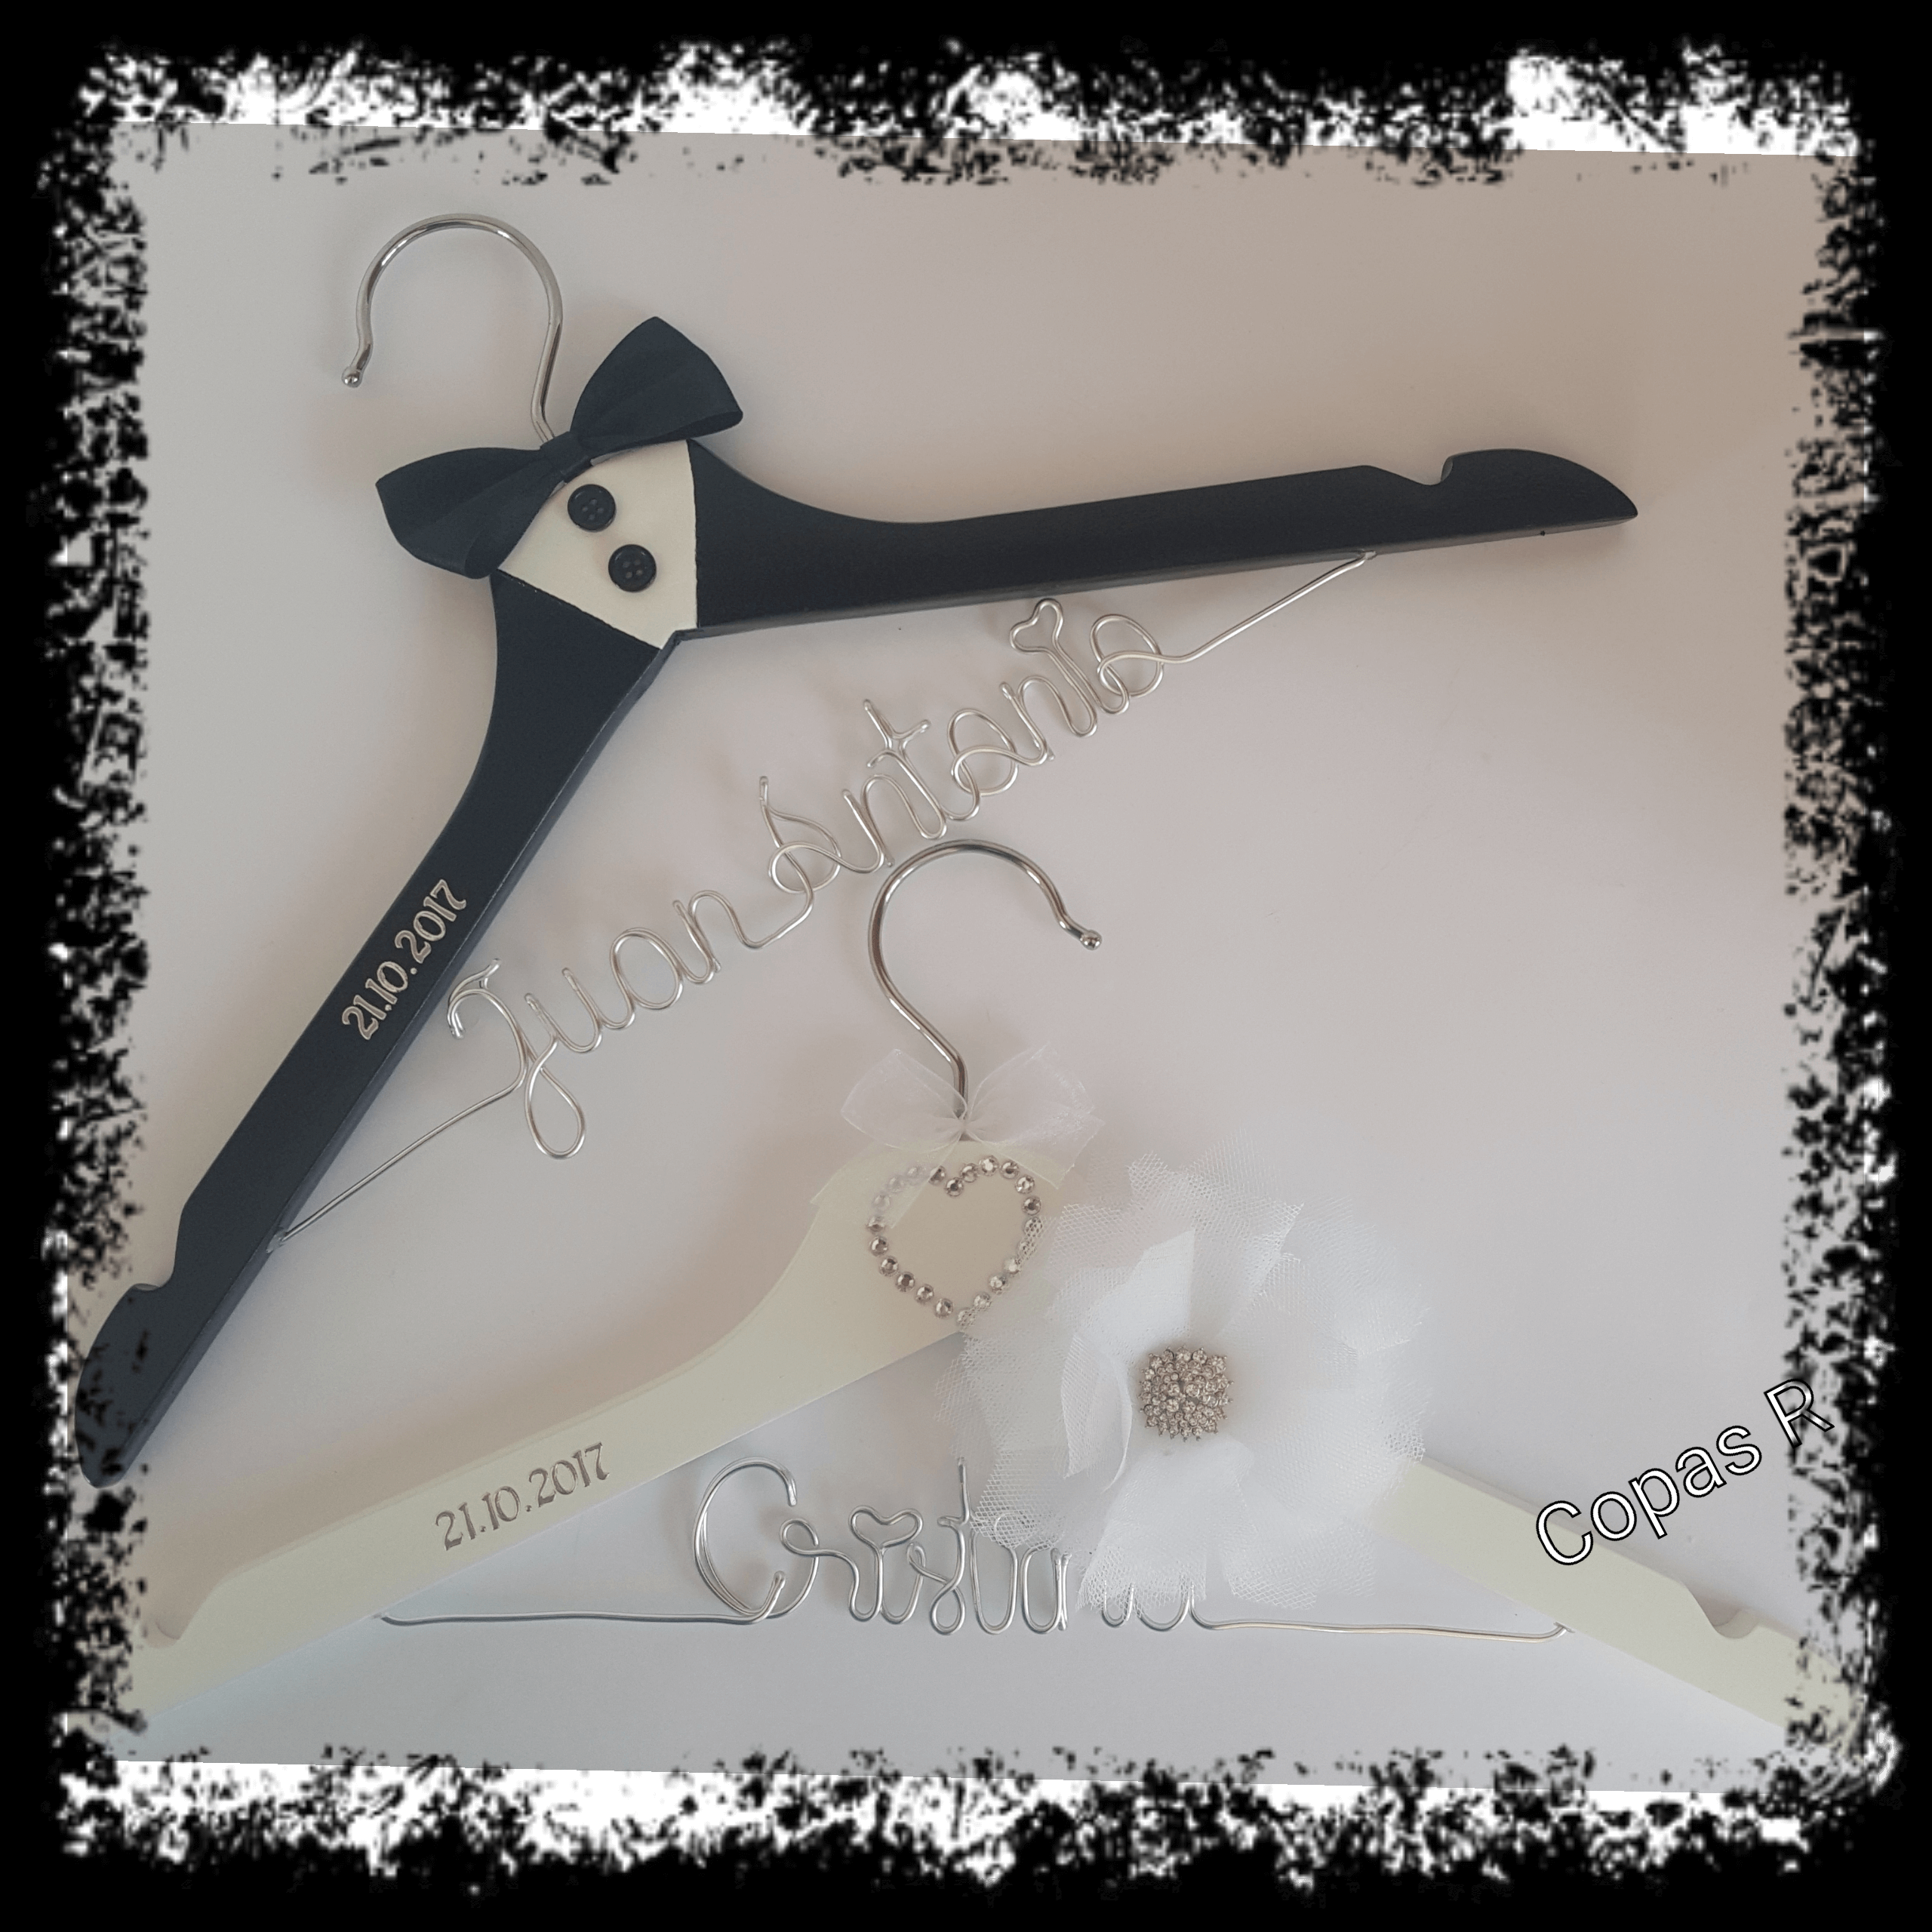 perchas personalizadas perchas personalizadas - perchas personalizadas 8 - Perchas personalizadas | perchas novios | perchas personalizadas boda